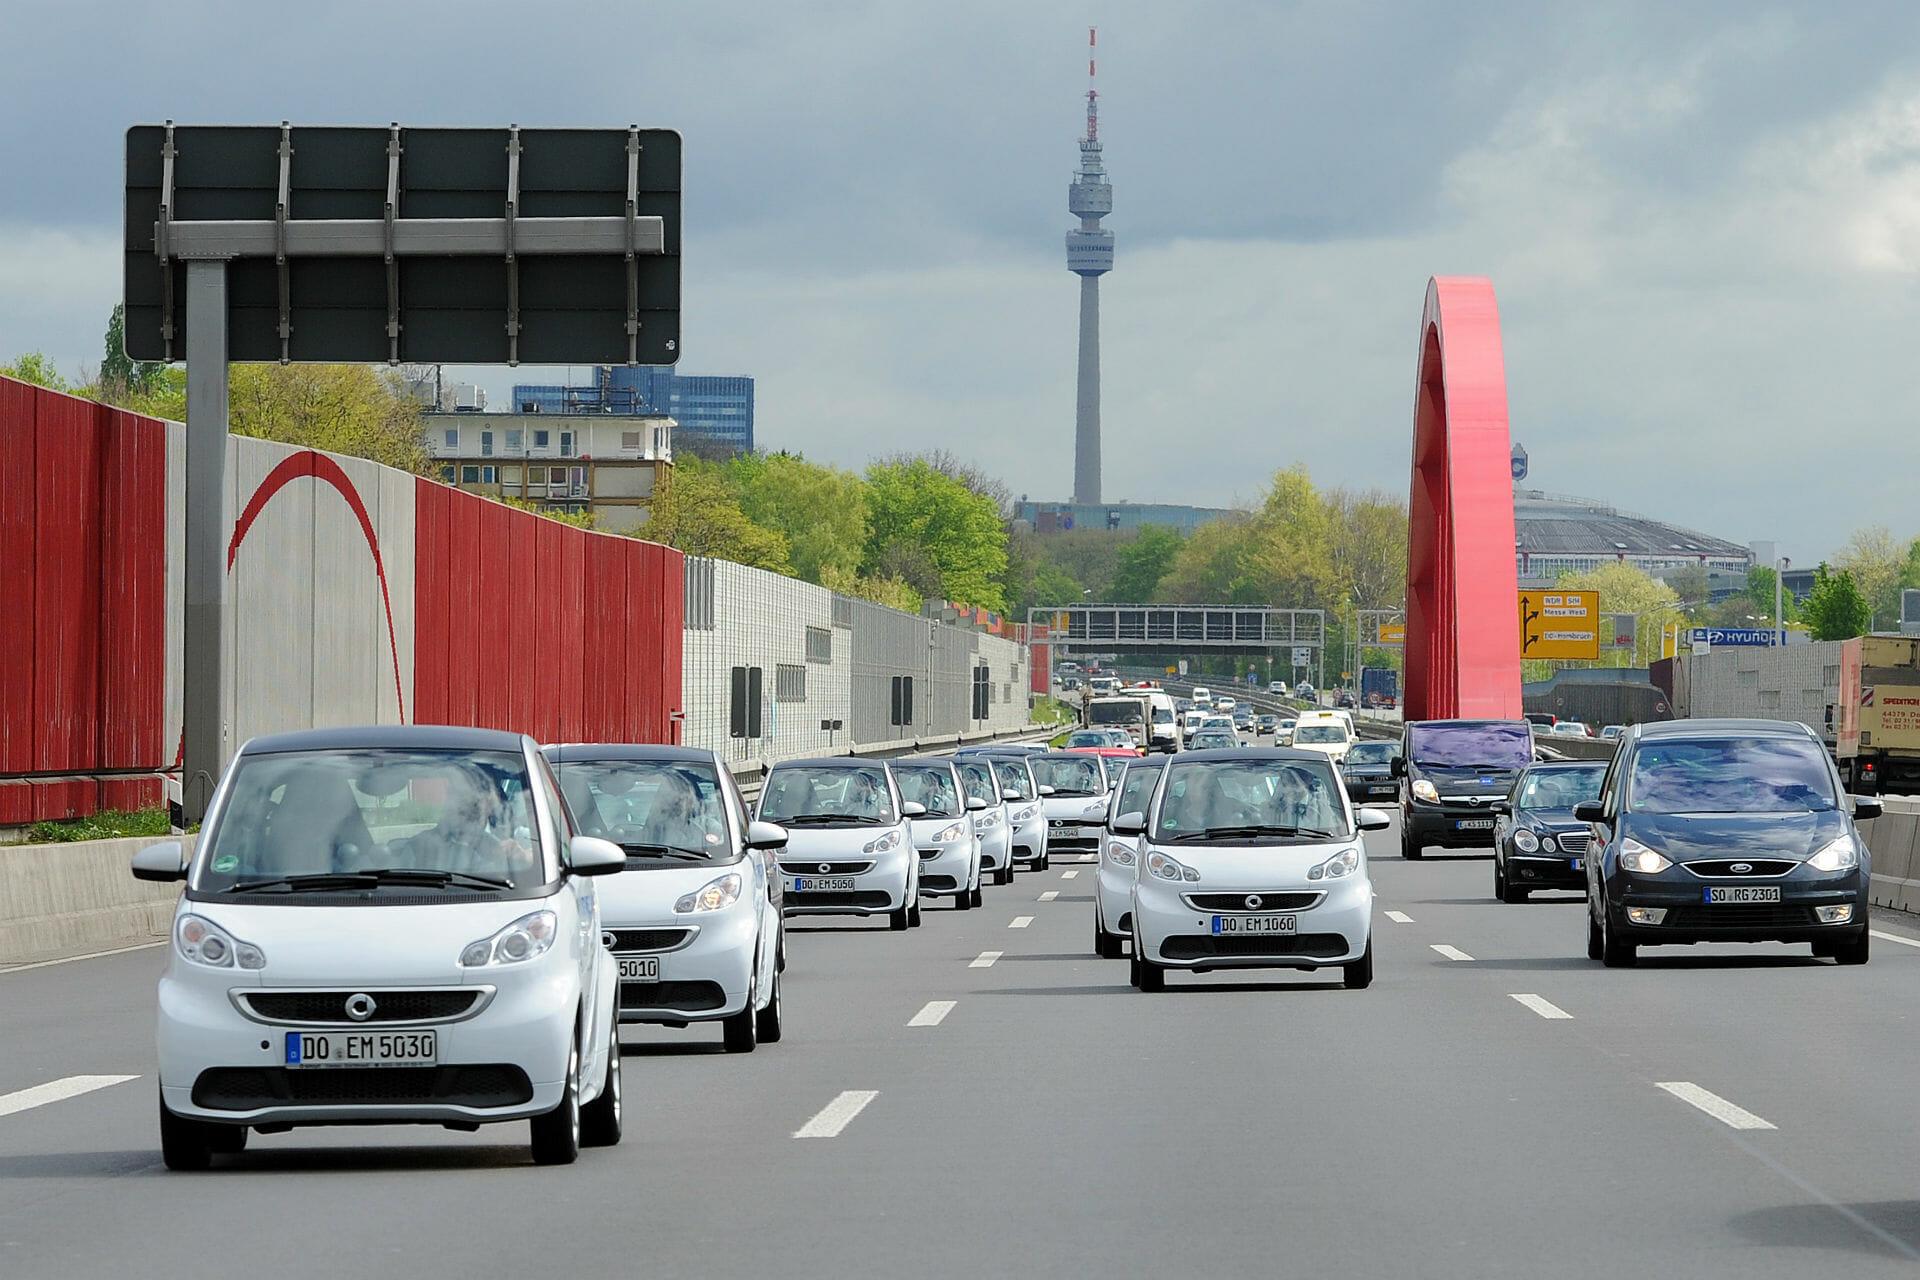 Zehn elektrische smarts, die die RWE-Standorte entlang der A40 verbinden.